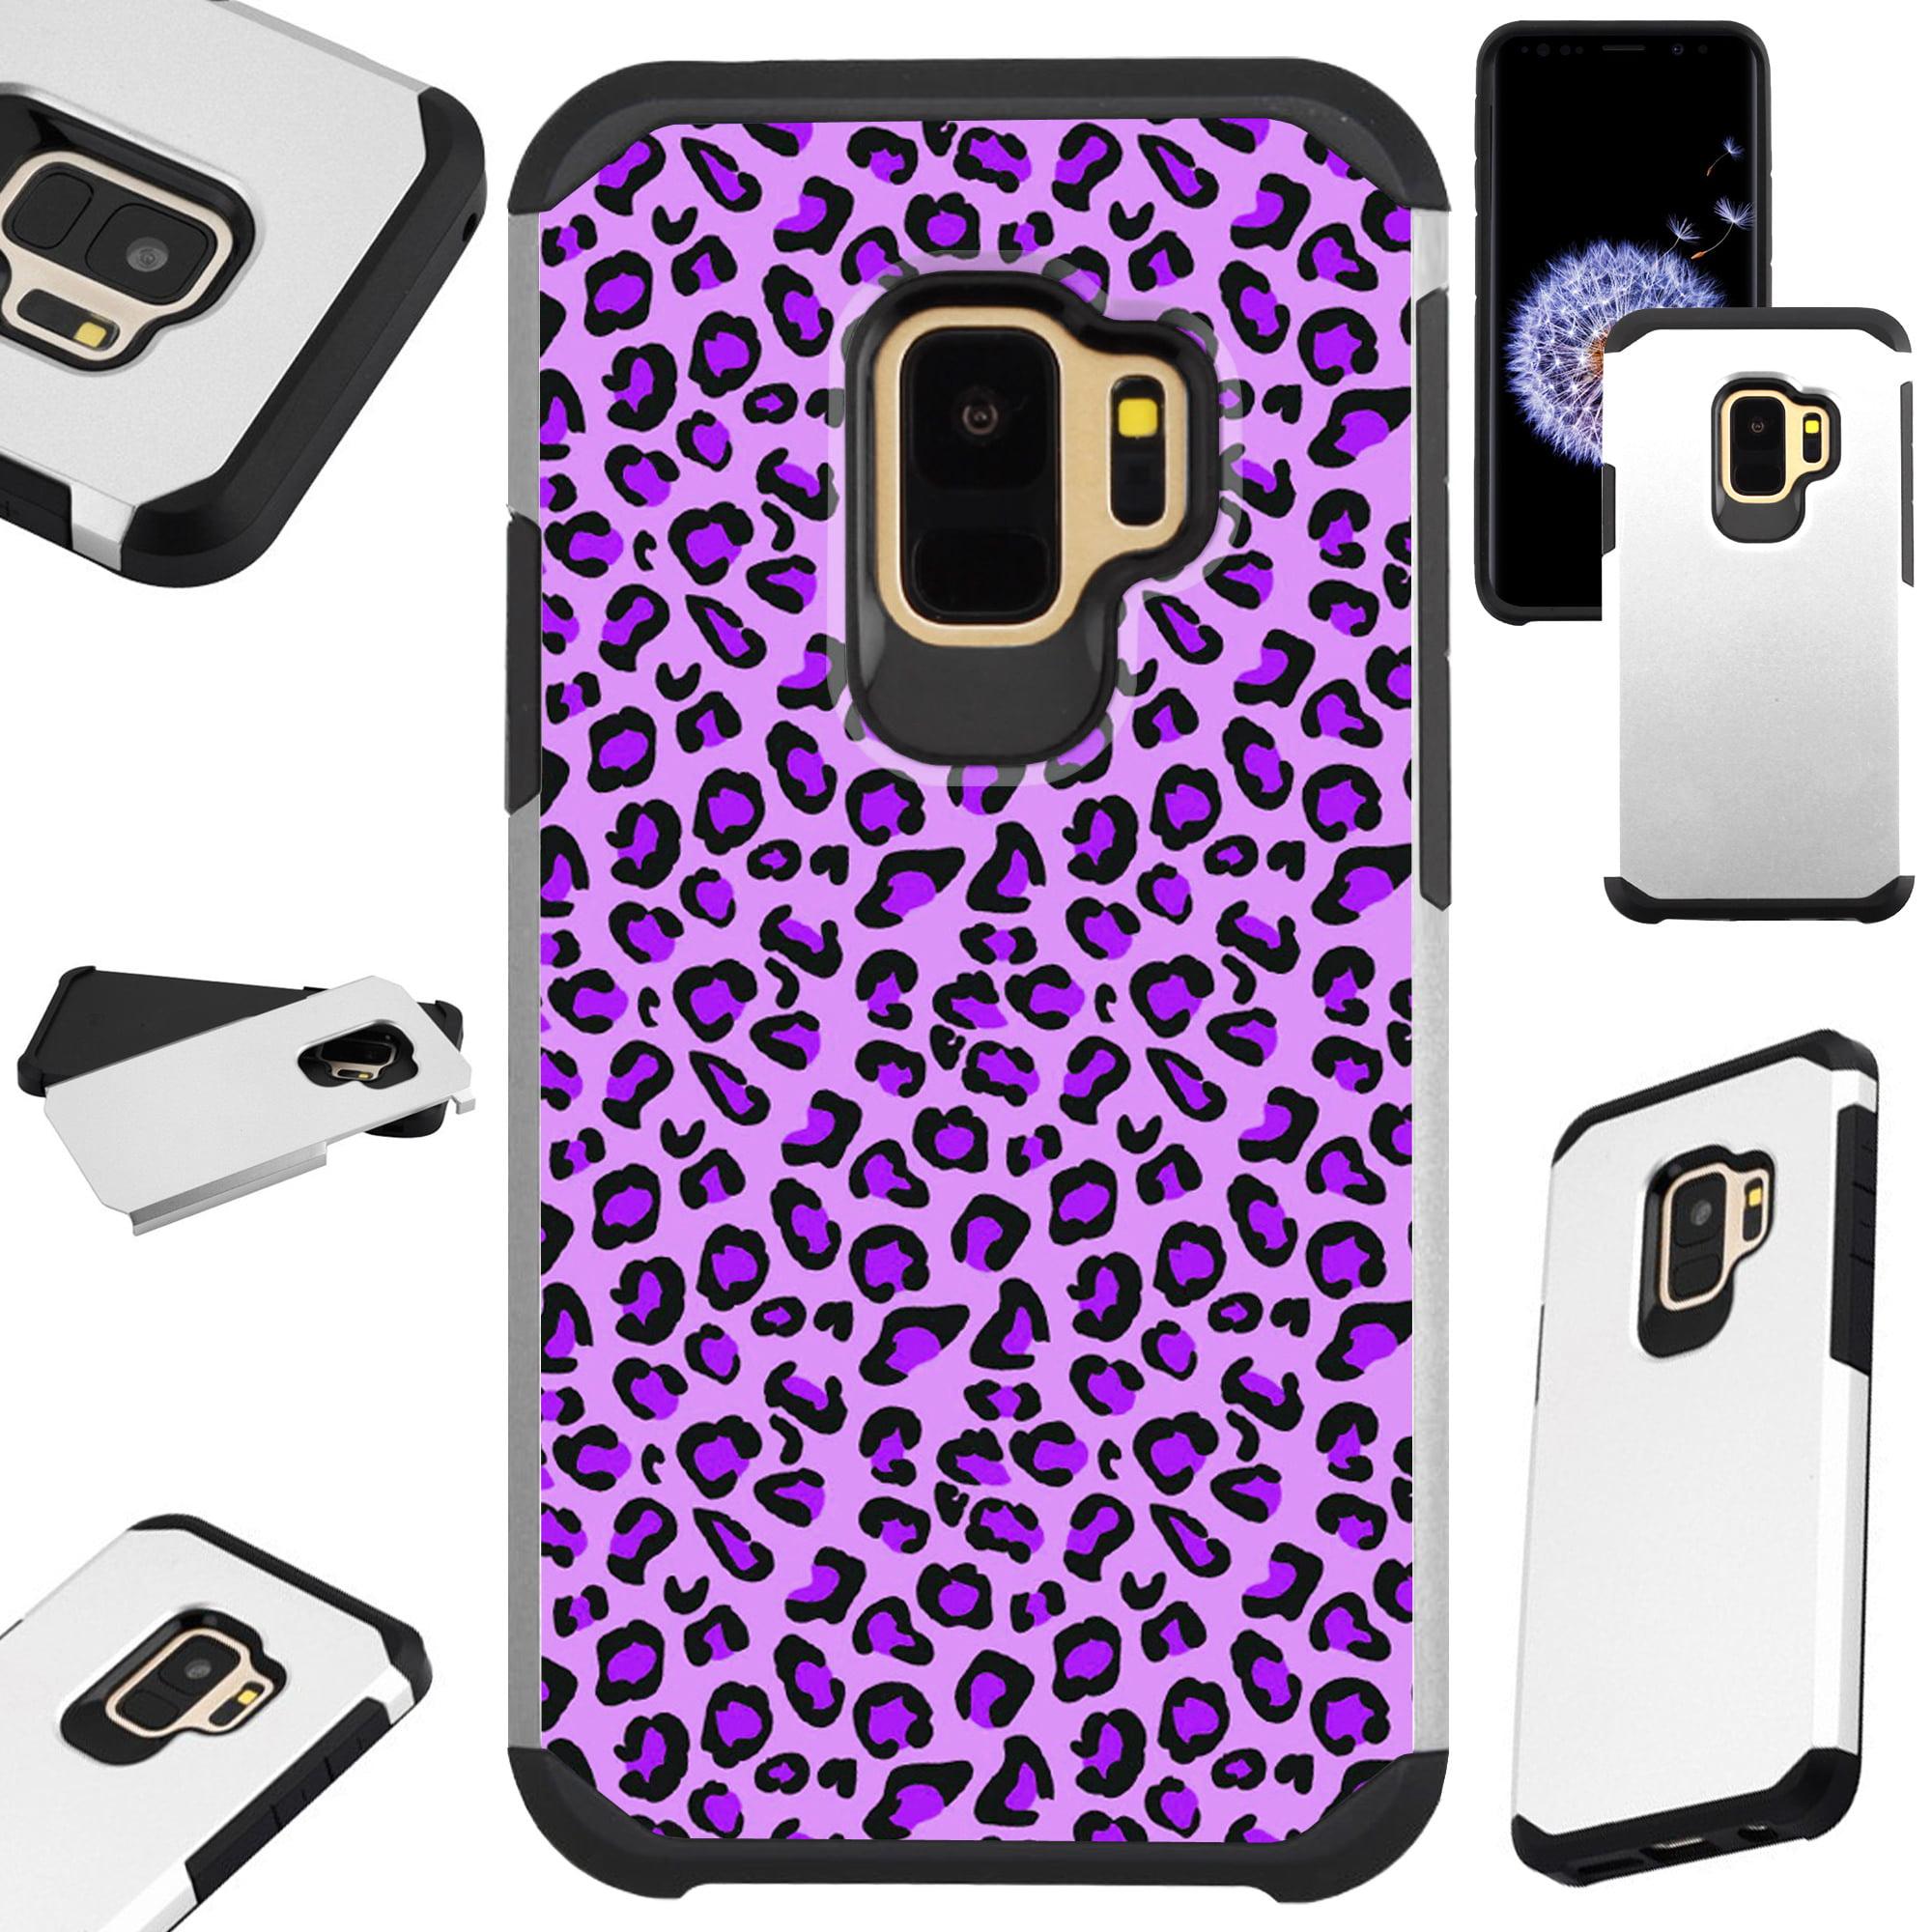 For Samsung Galaxy S9 Plus / Samsung Galaxy S9+ Case Hybrid TPU Fusion Phone Cover (Purple Leopard Skin)